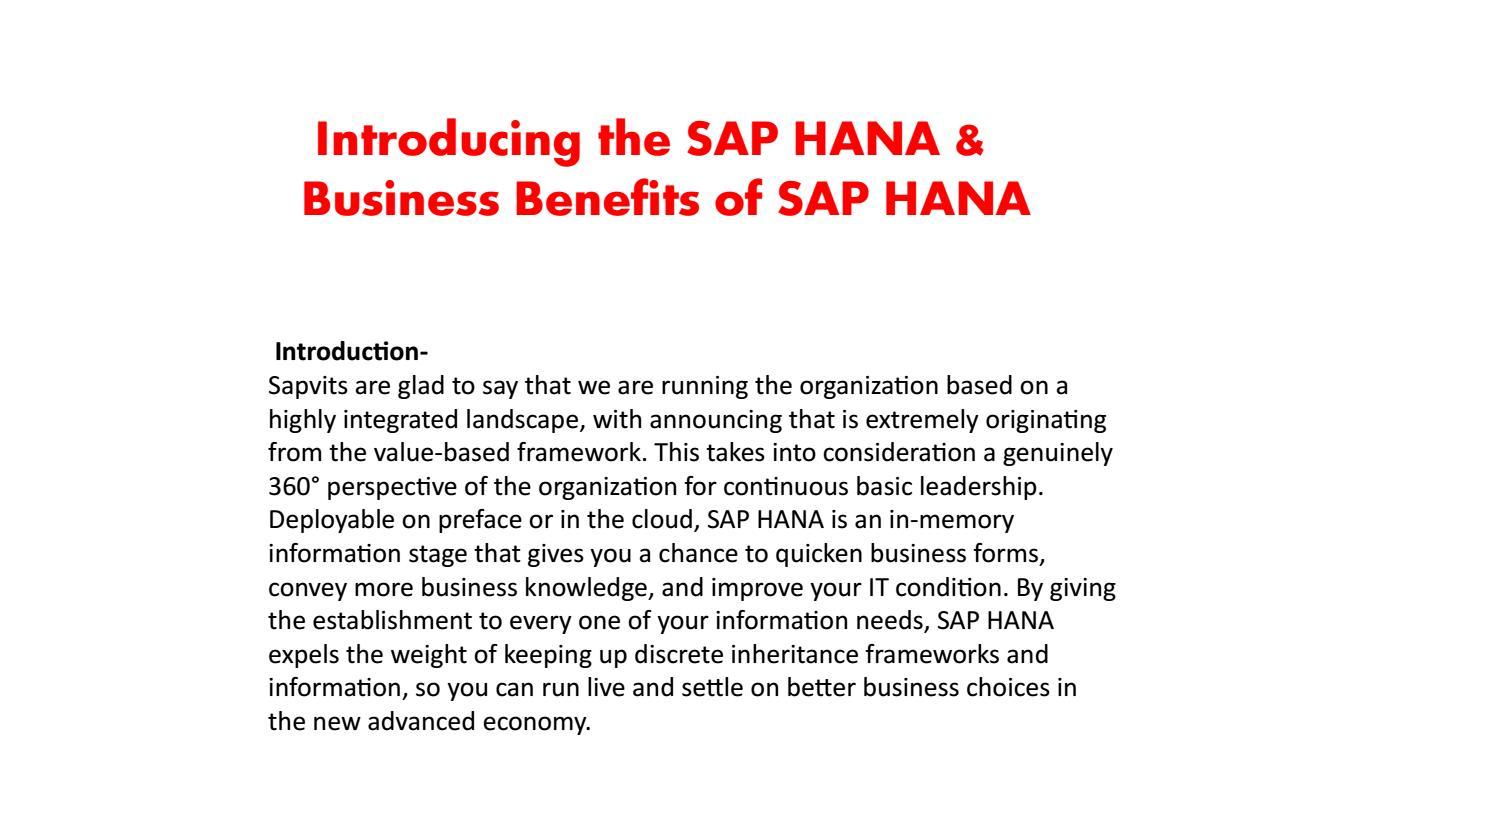 SAP HANA Basics PPT by shruti allentics - issuu